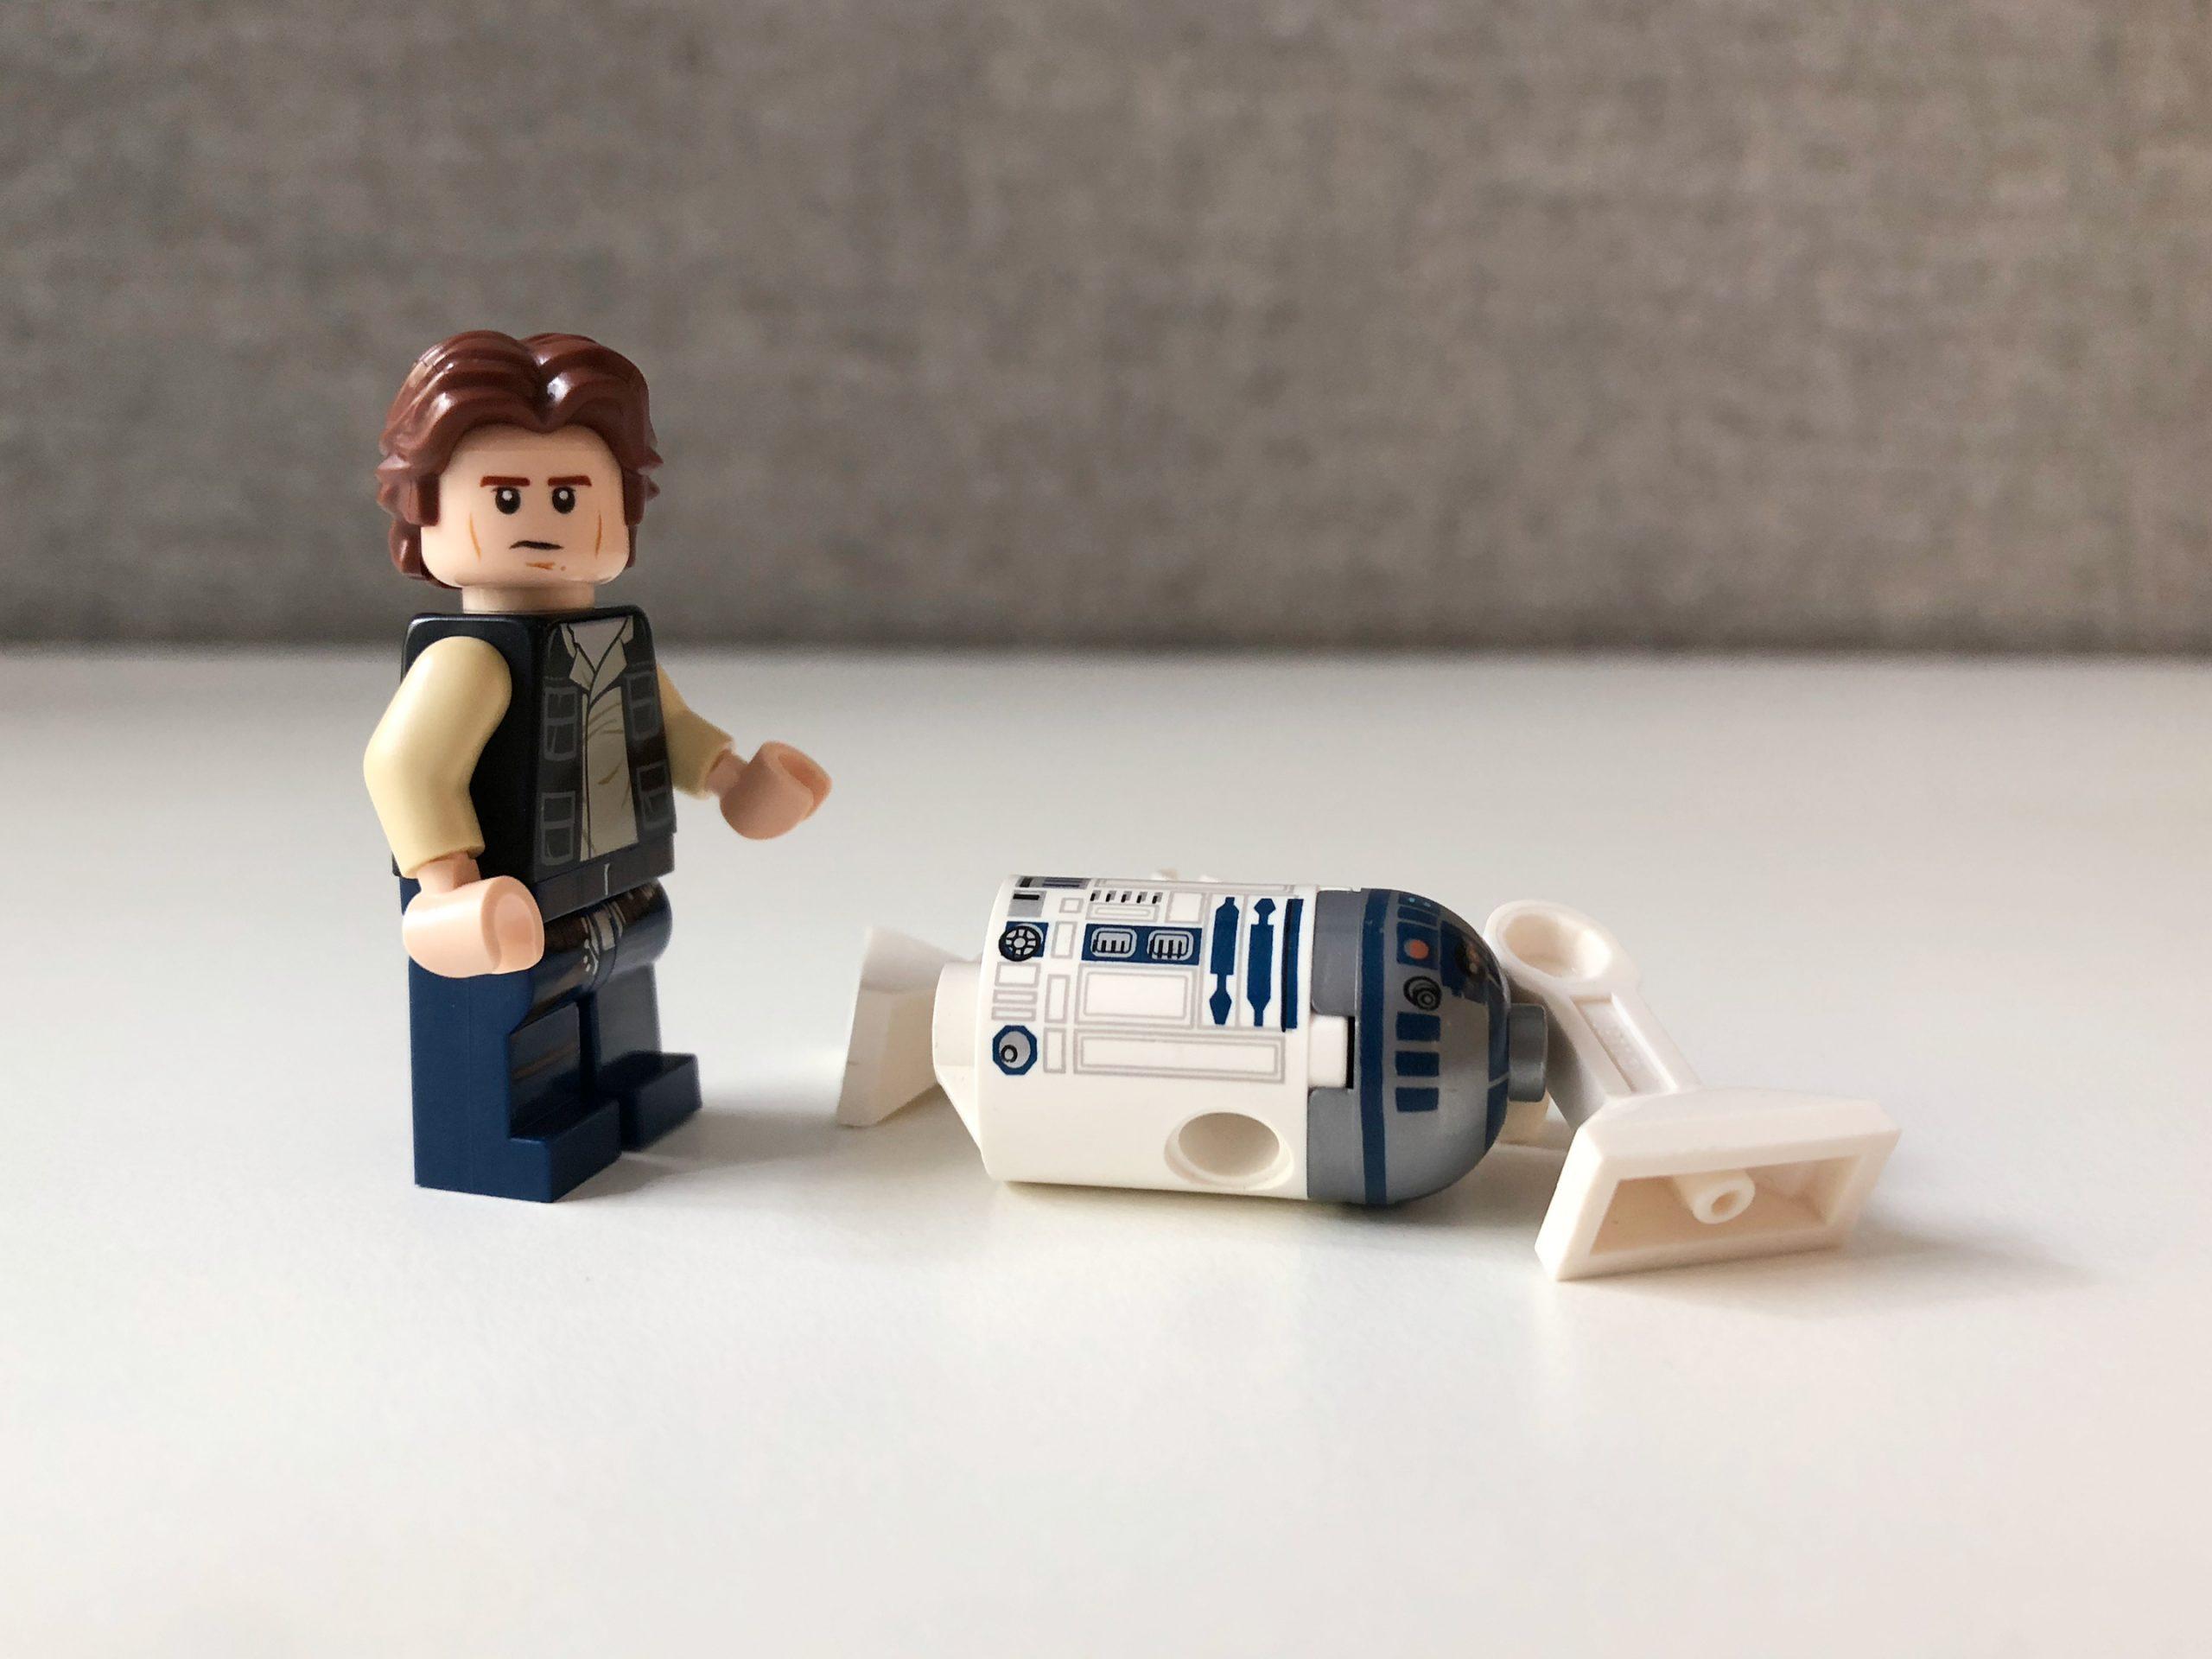 Han-Solo-broken-R2D2-Digital-Project-Manager